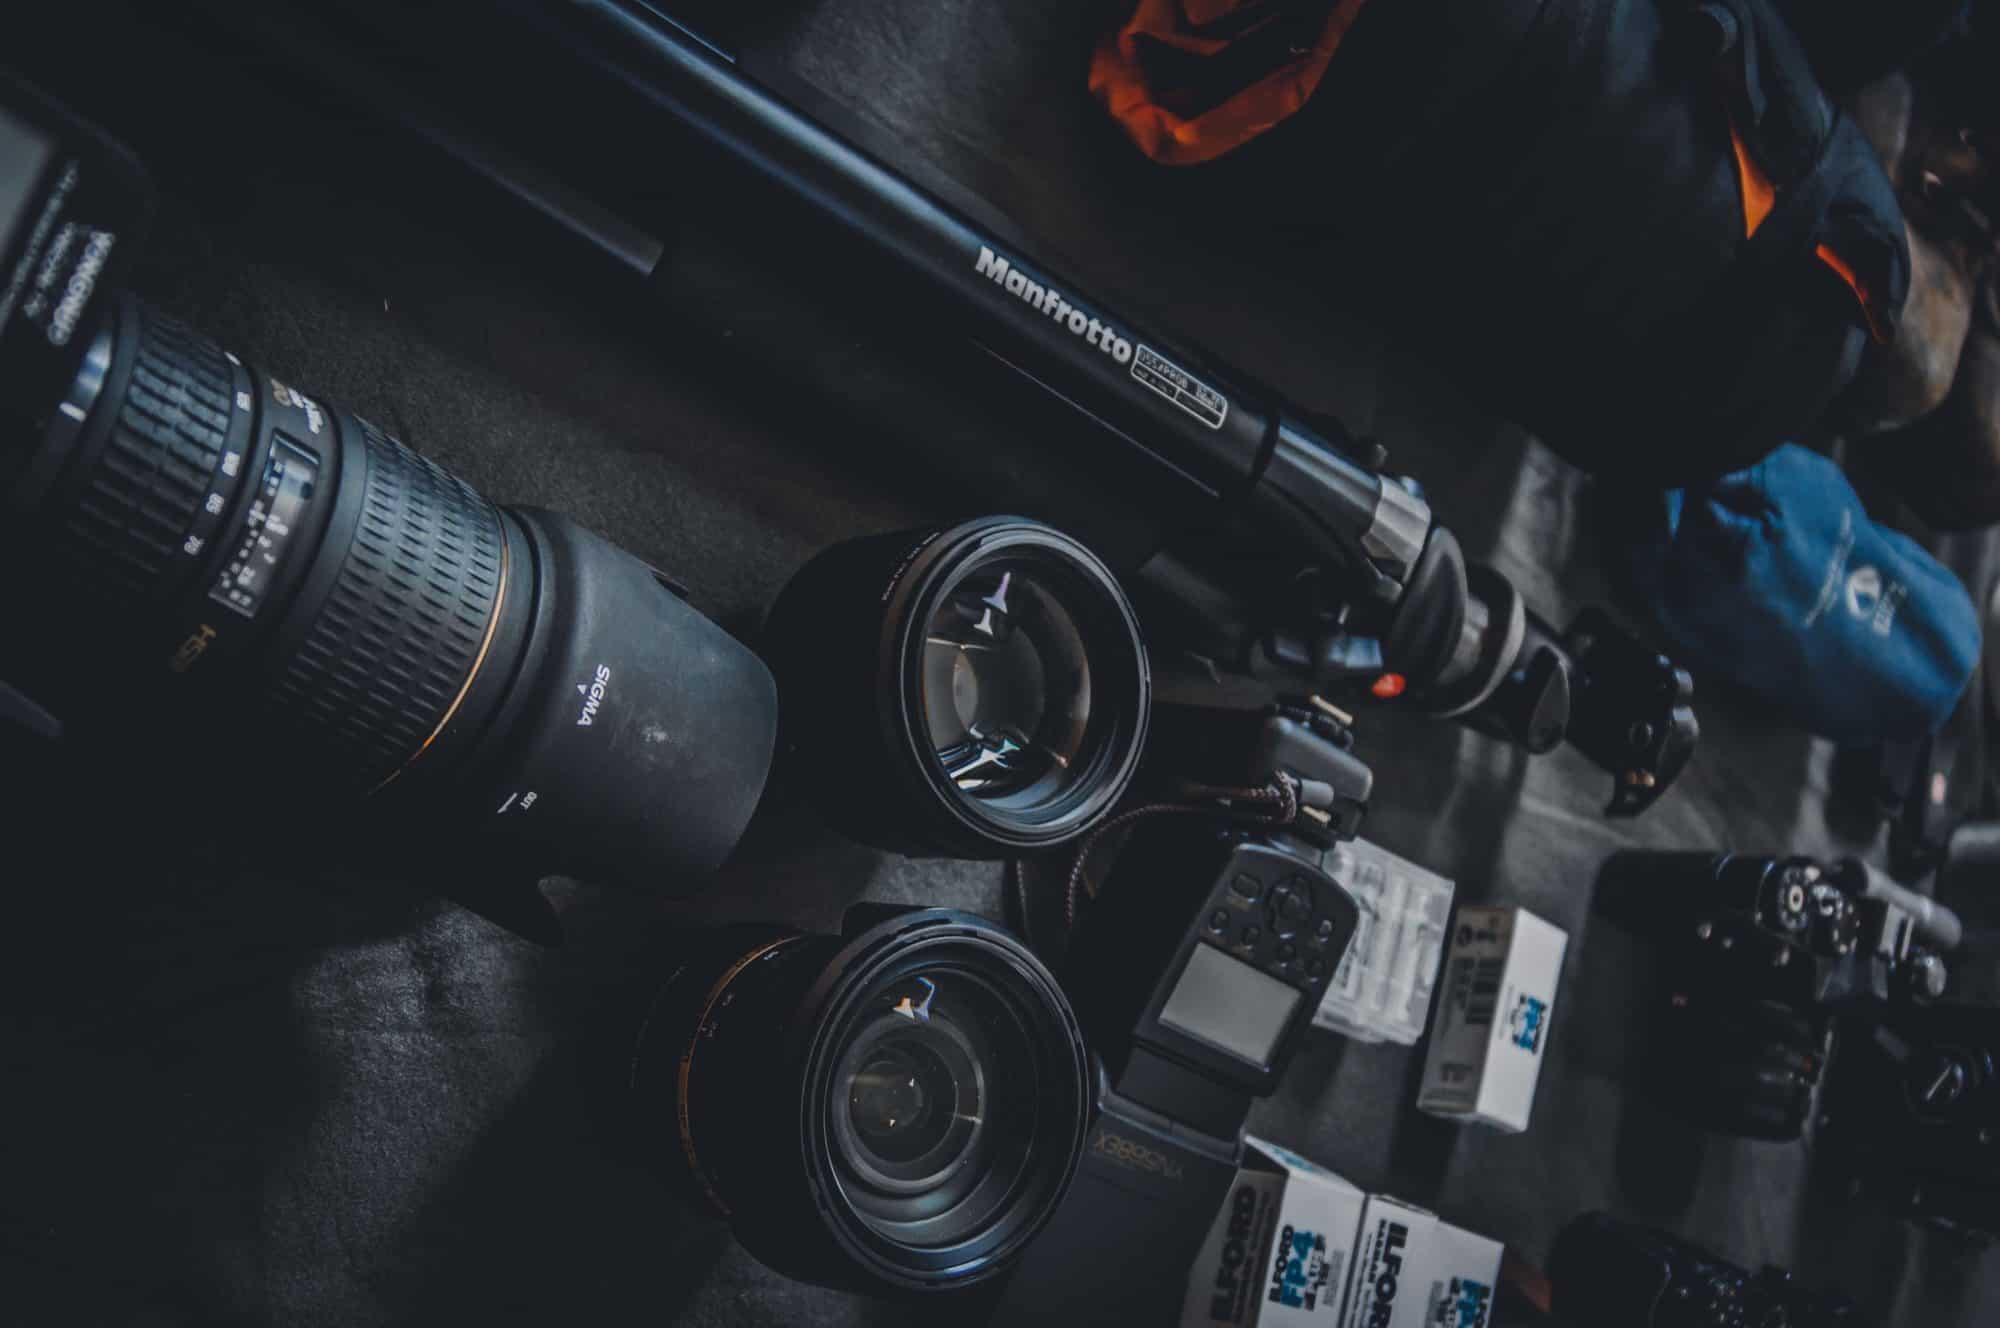 Kamera, Stativ und Objektive